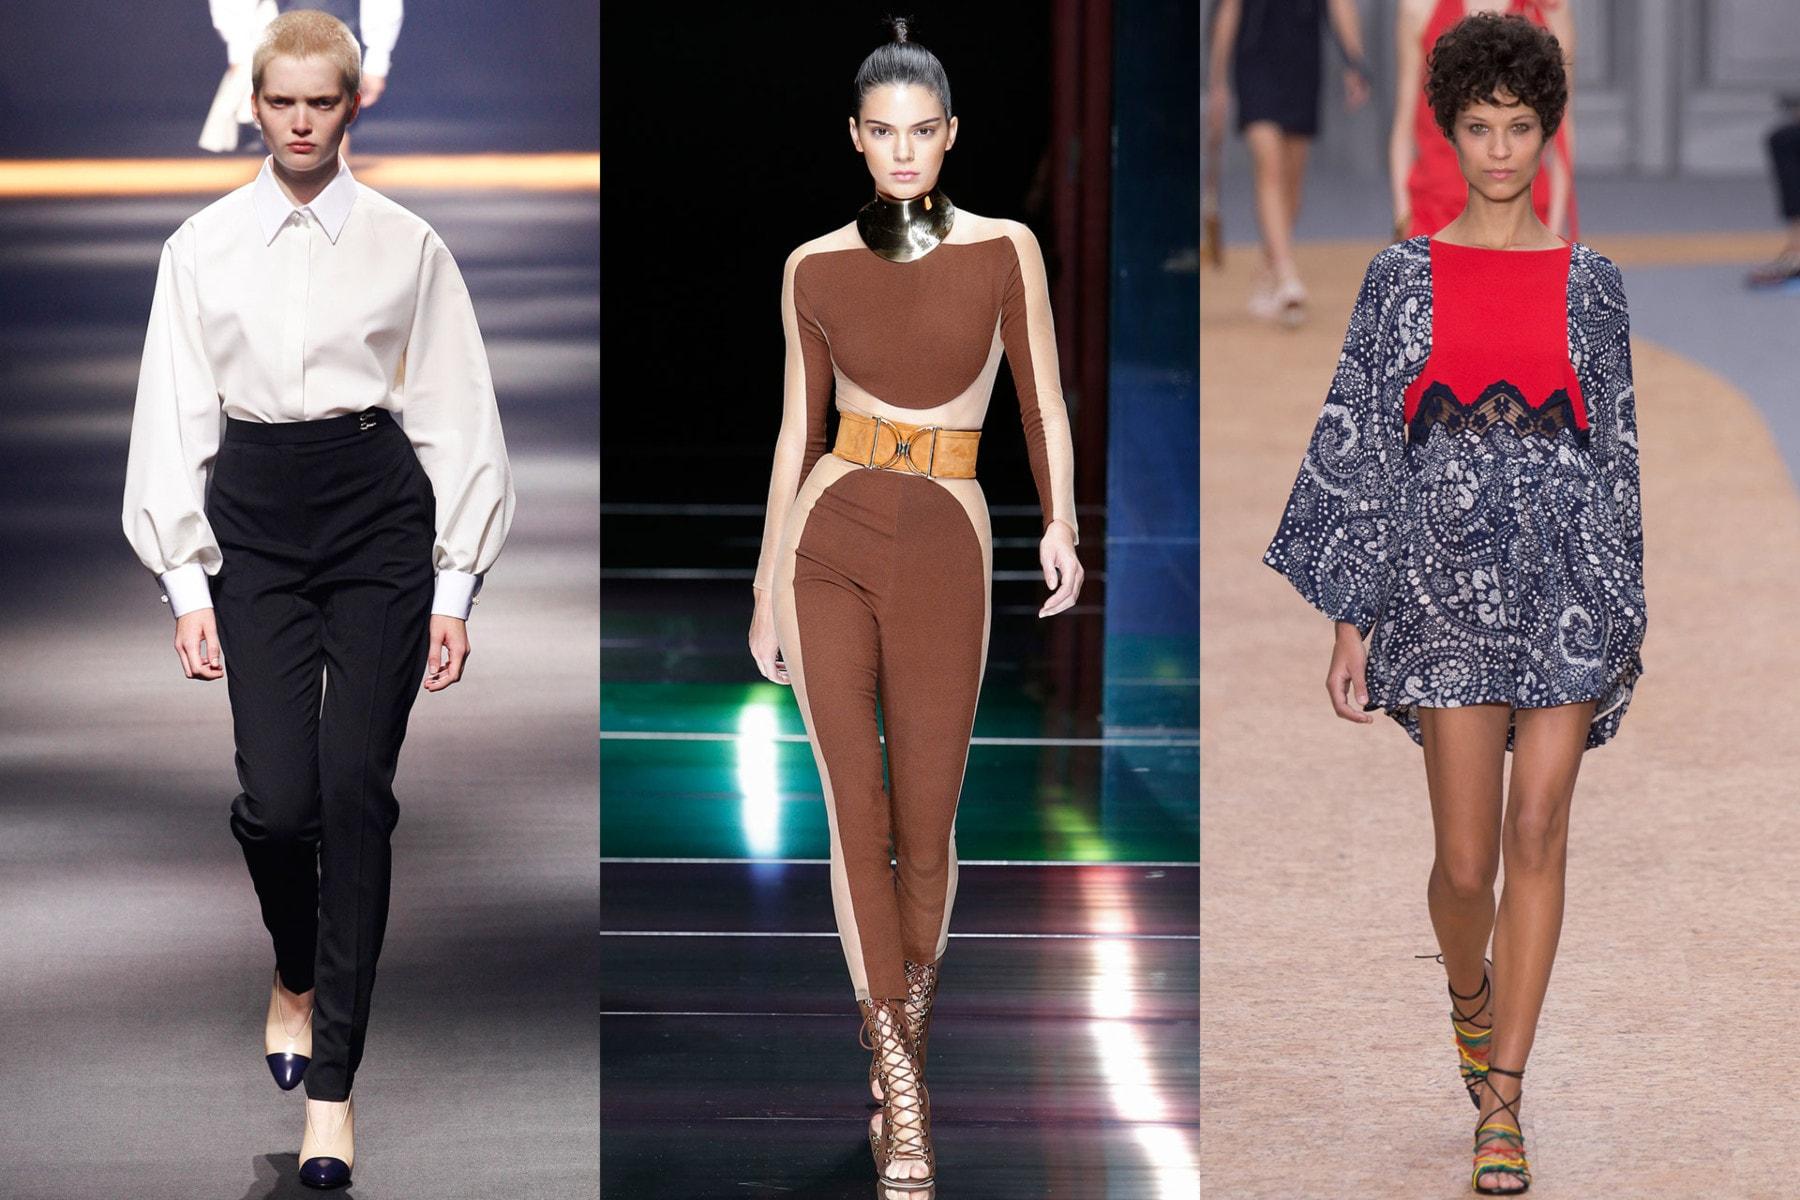 0215a0aef9ab4 Suzy Menkes at Paris fashion week  day three - Vogue Australia